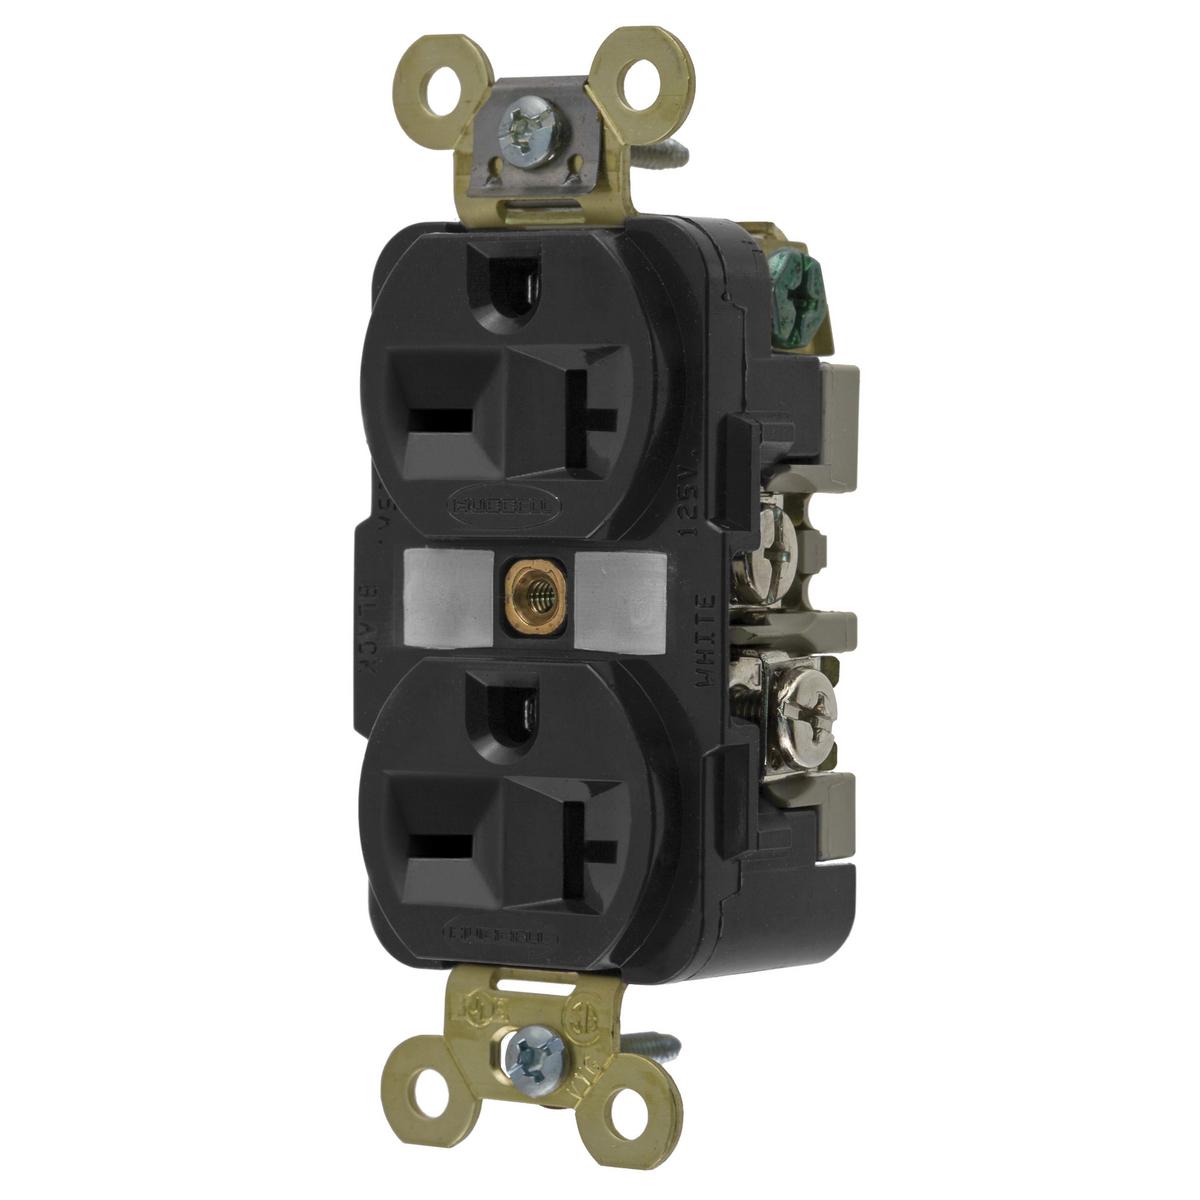 Hubbell HBL5462BKDUP Receptacle, IND GRD, 20A 250V, 6-20R, BK